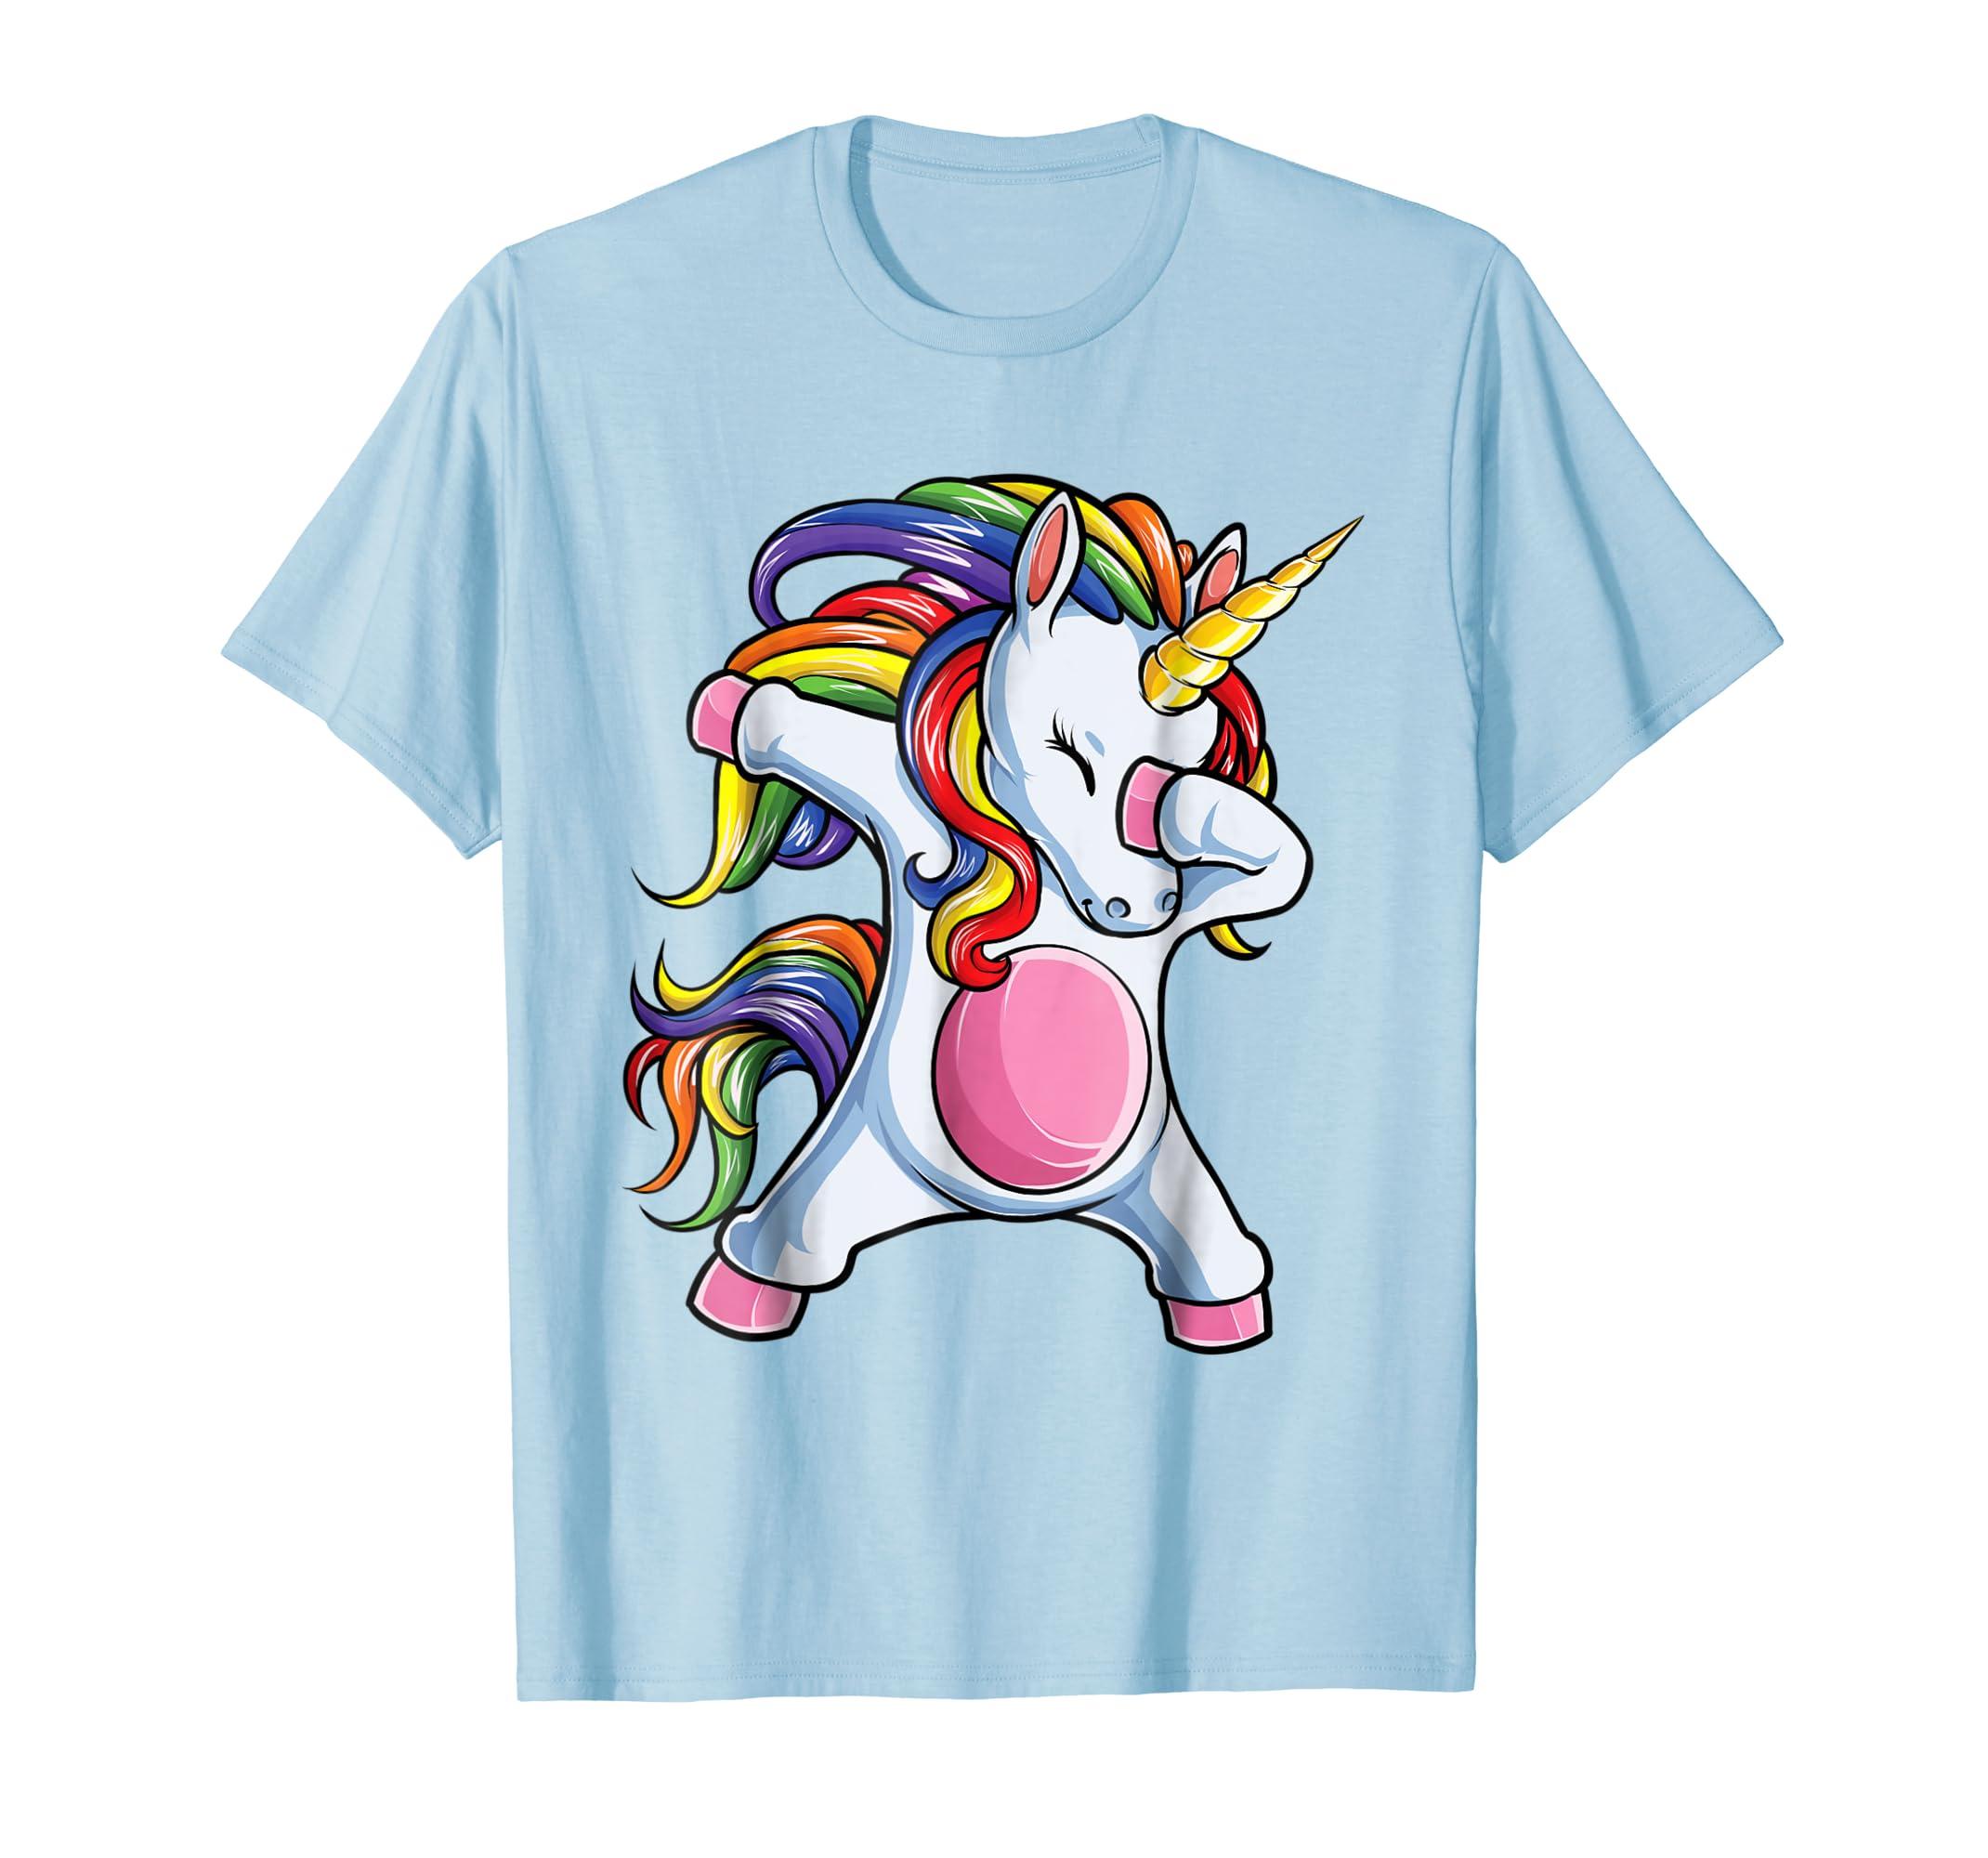 Dabbing Unicorn T shirt Girls Gifts Kids Boys Rainbow Dab-mt